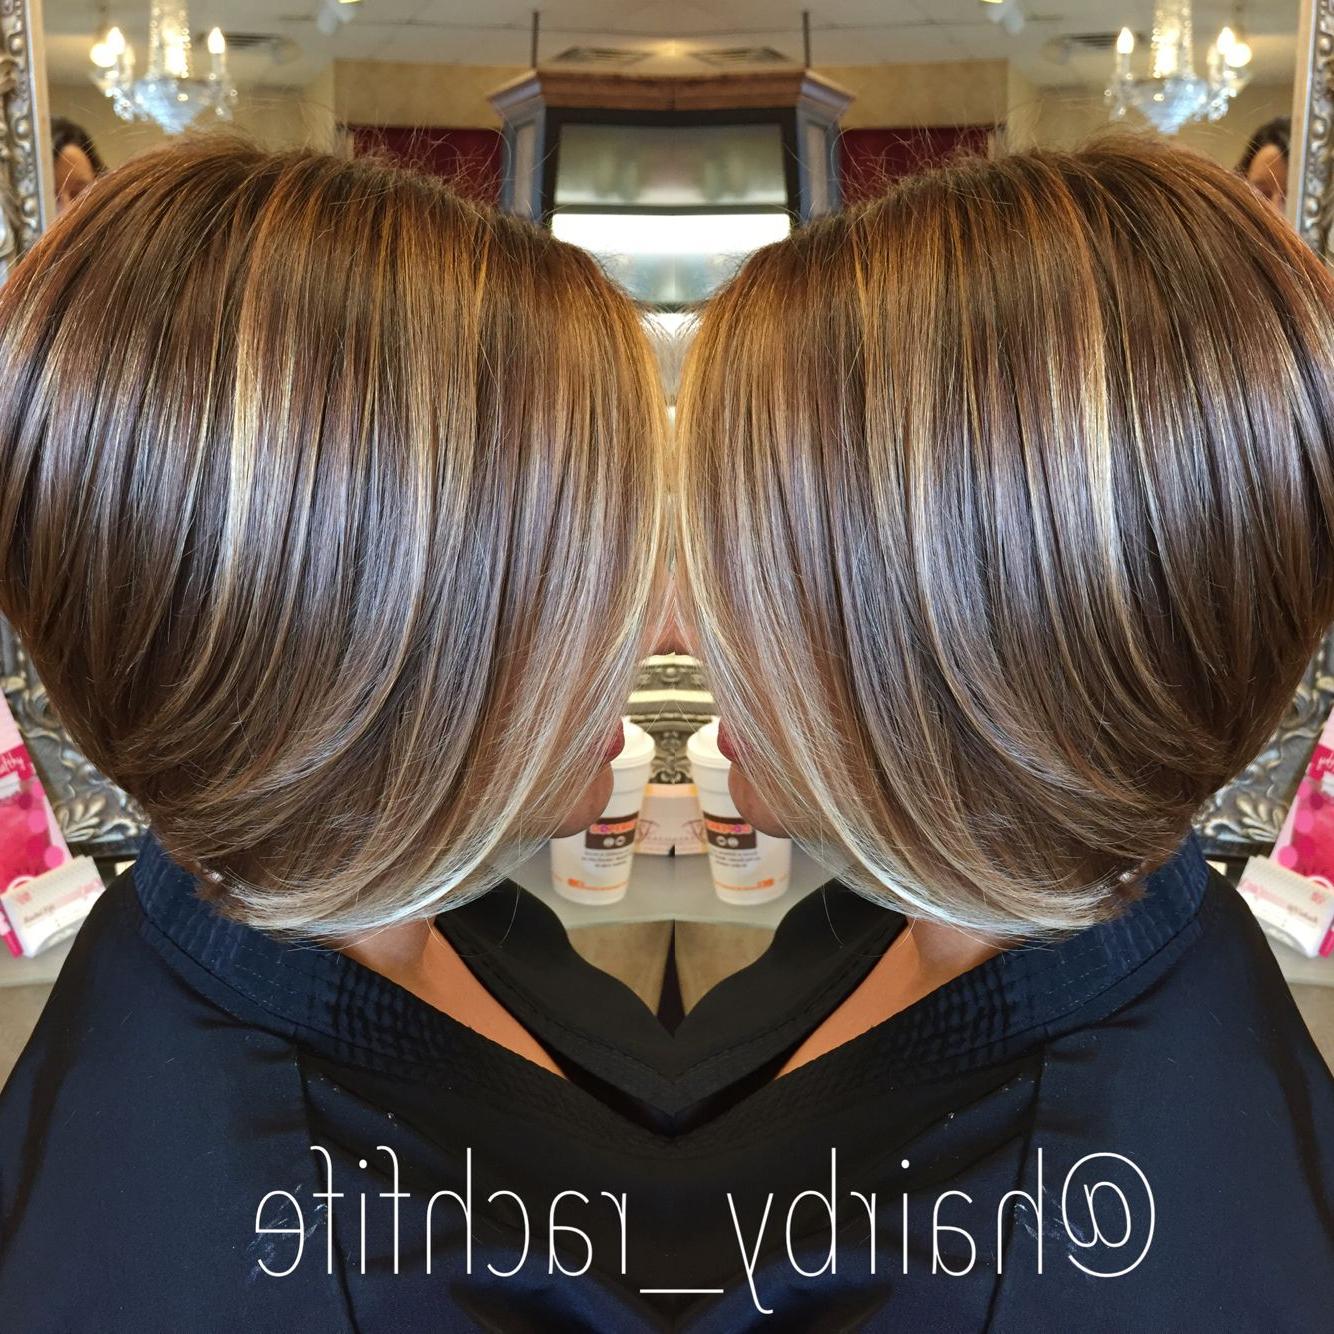 Short Bob Haircut With Subtle Balayage Highlights (View 13 of 25)